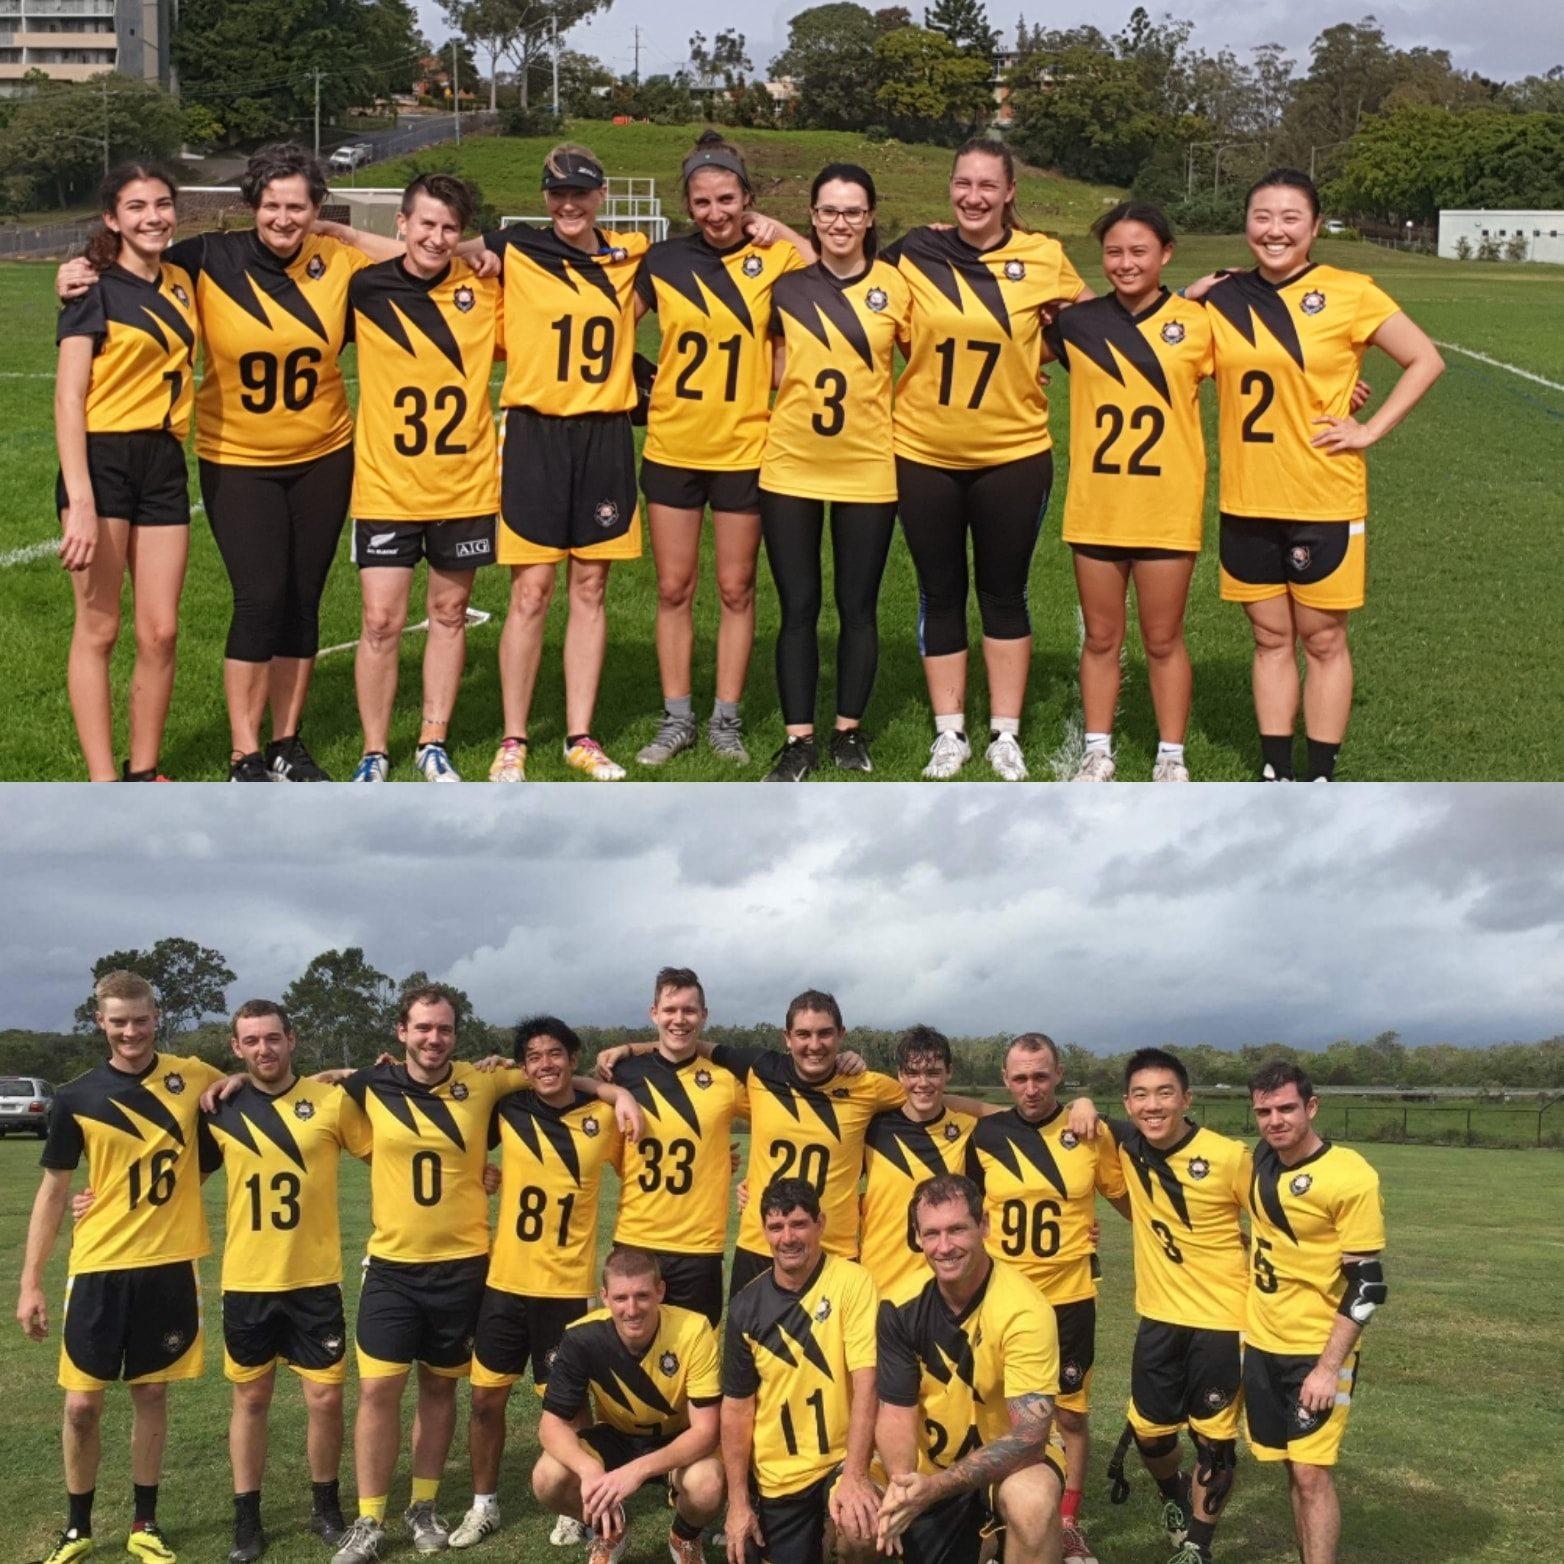 Brisbane Eagles Lacrosse Club